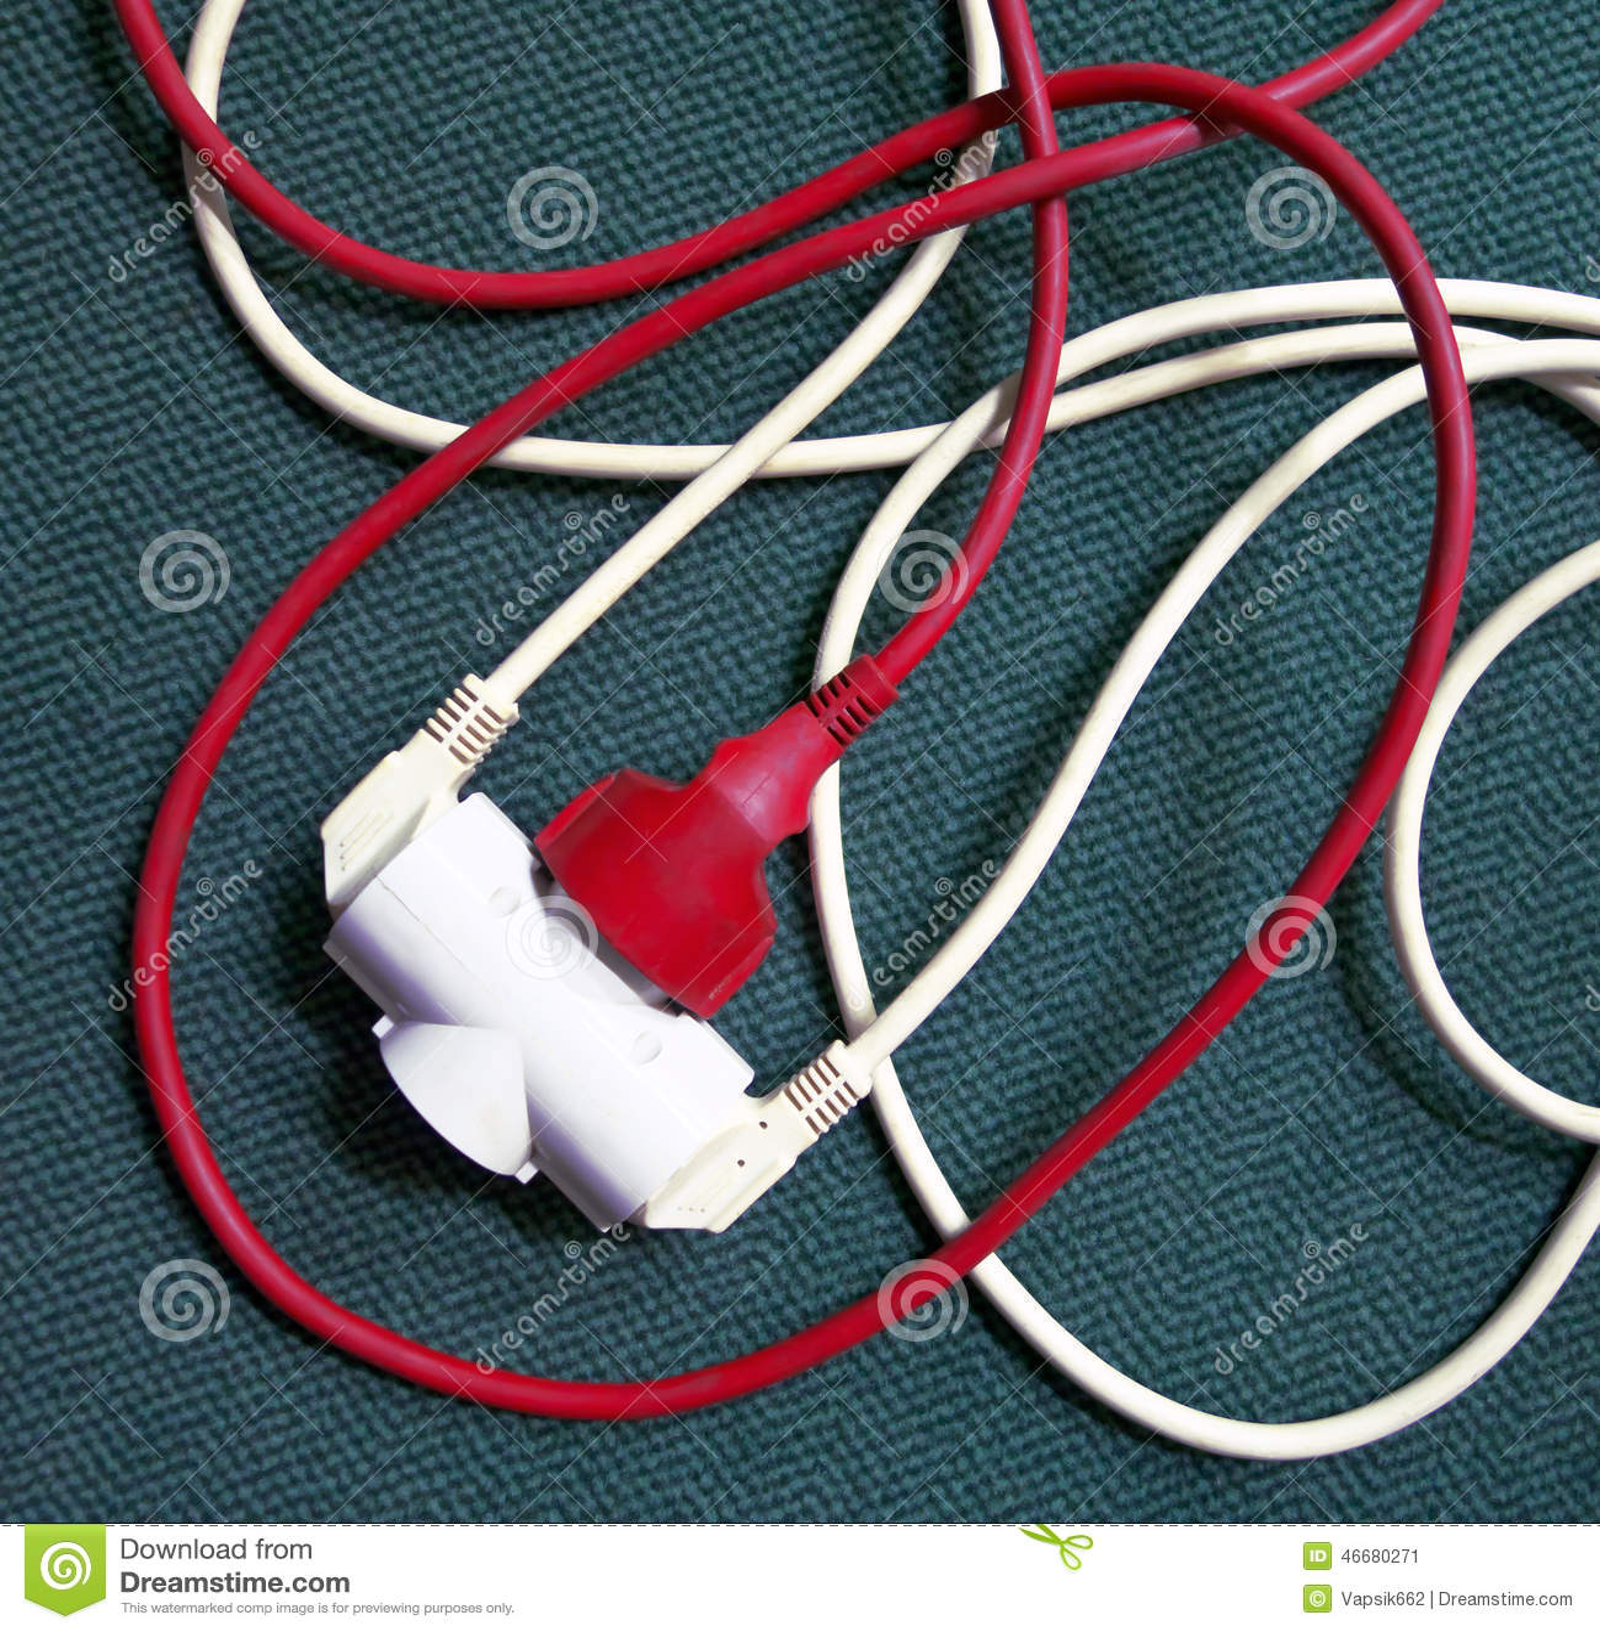 Tangled Extension Cords : Tangled extension cords